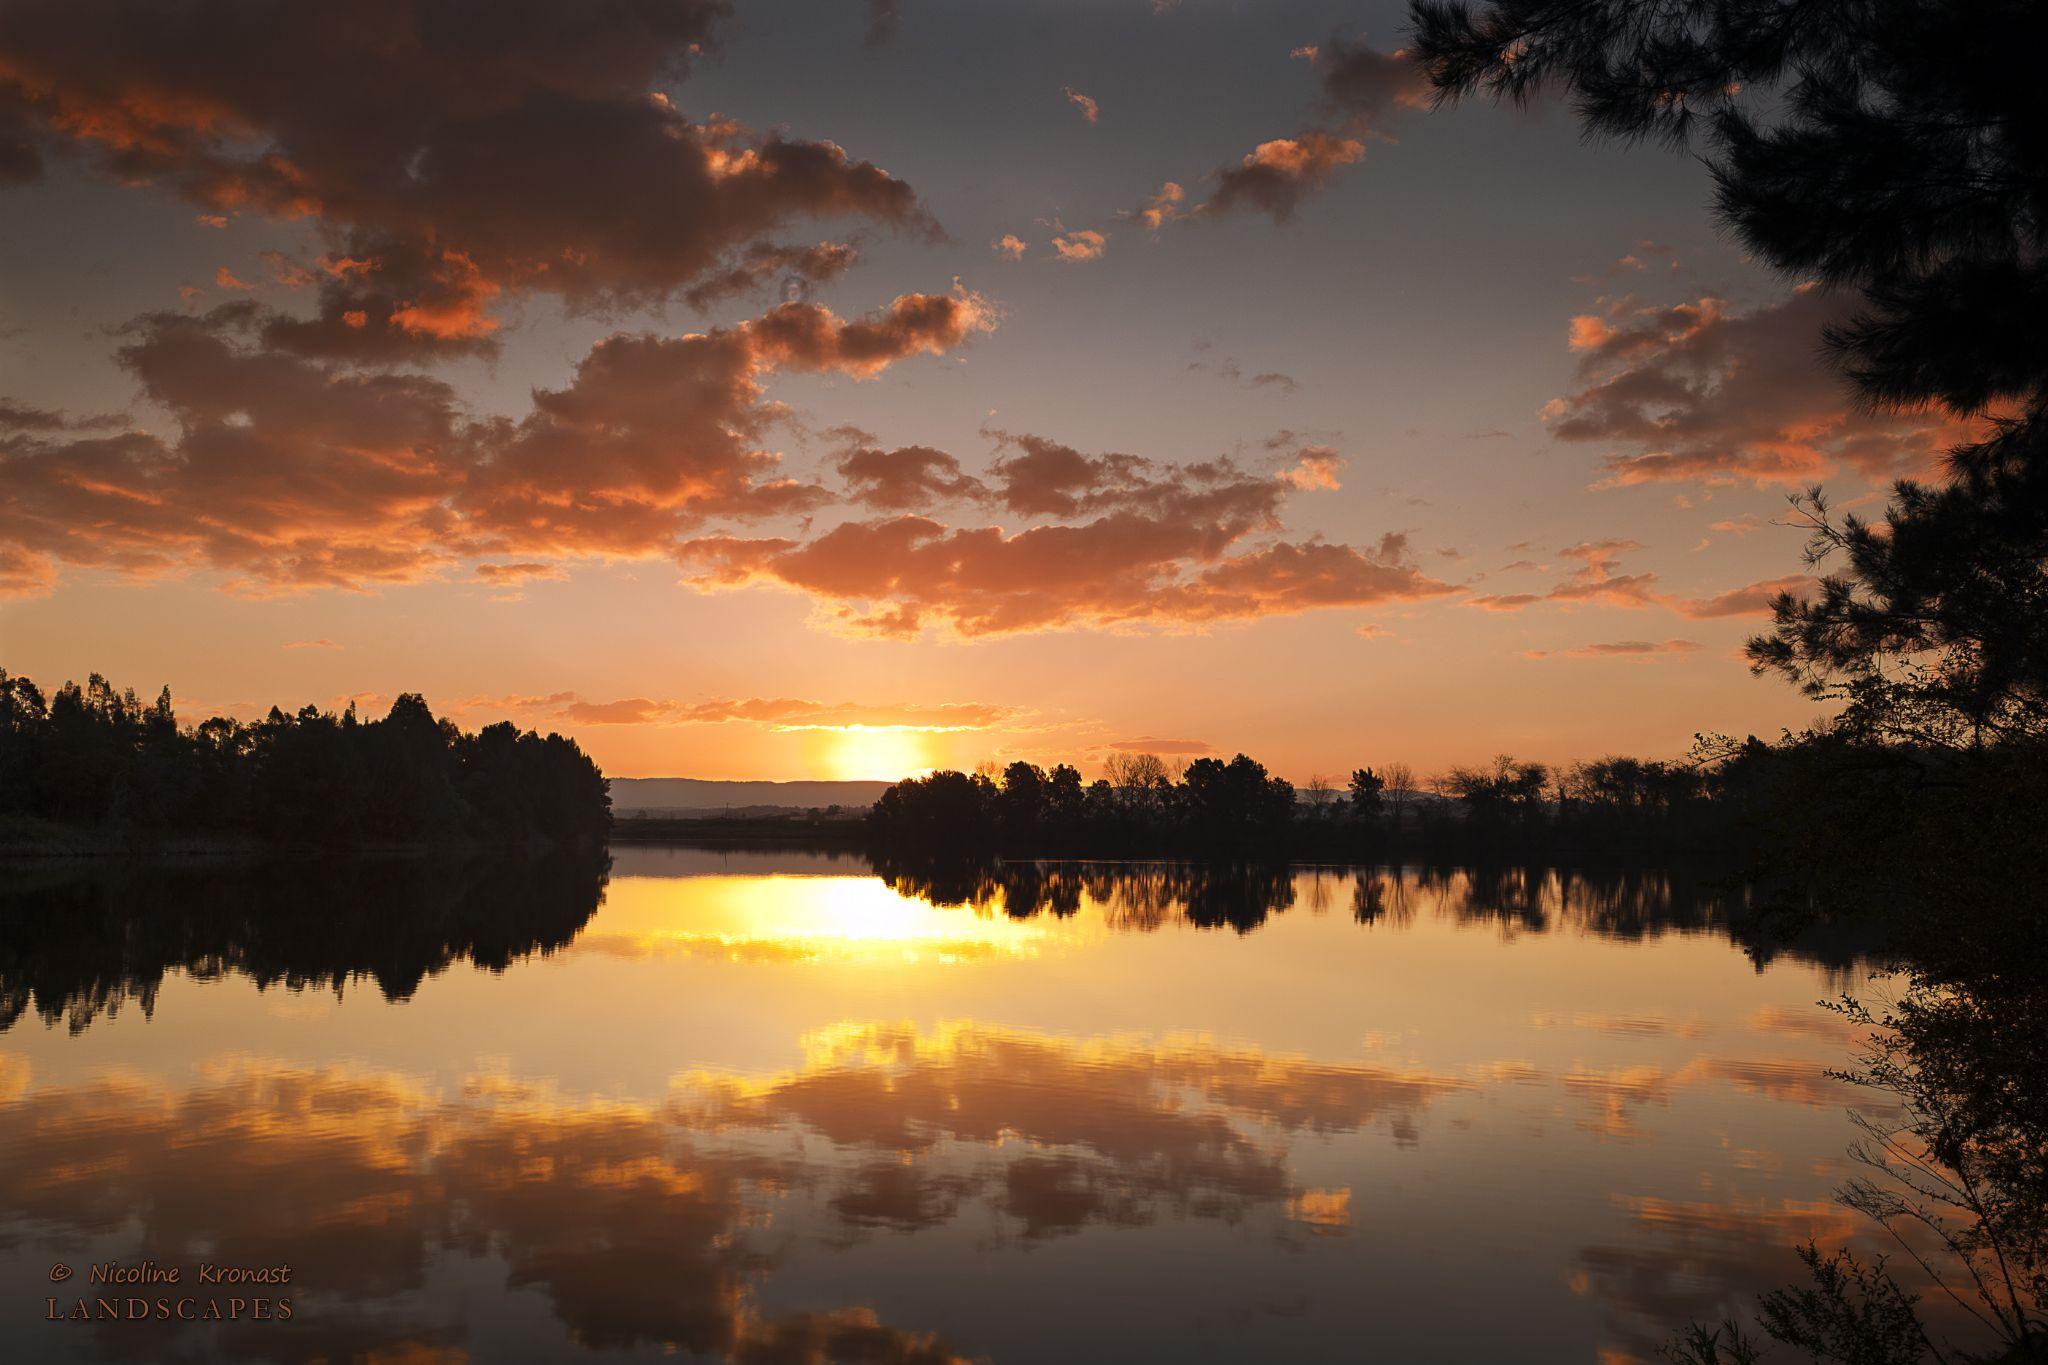 Windsor Sunset by nicolinekronast